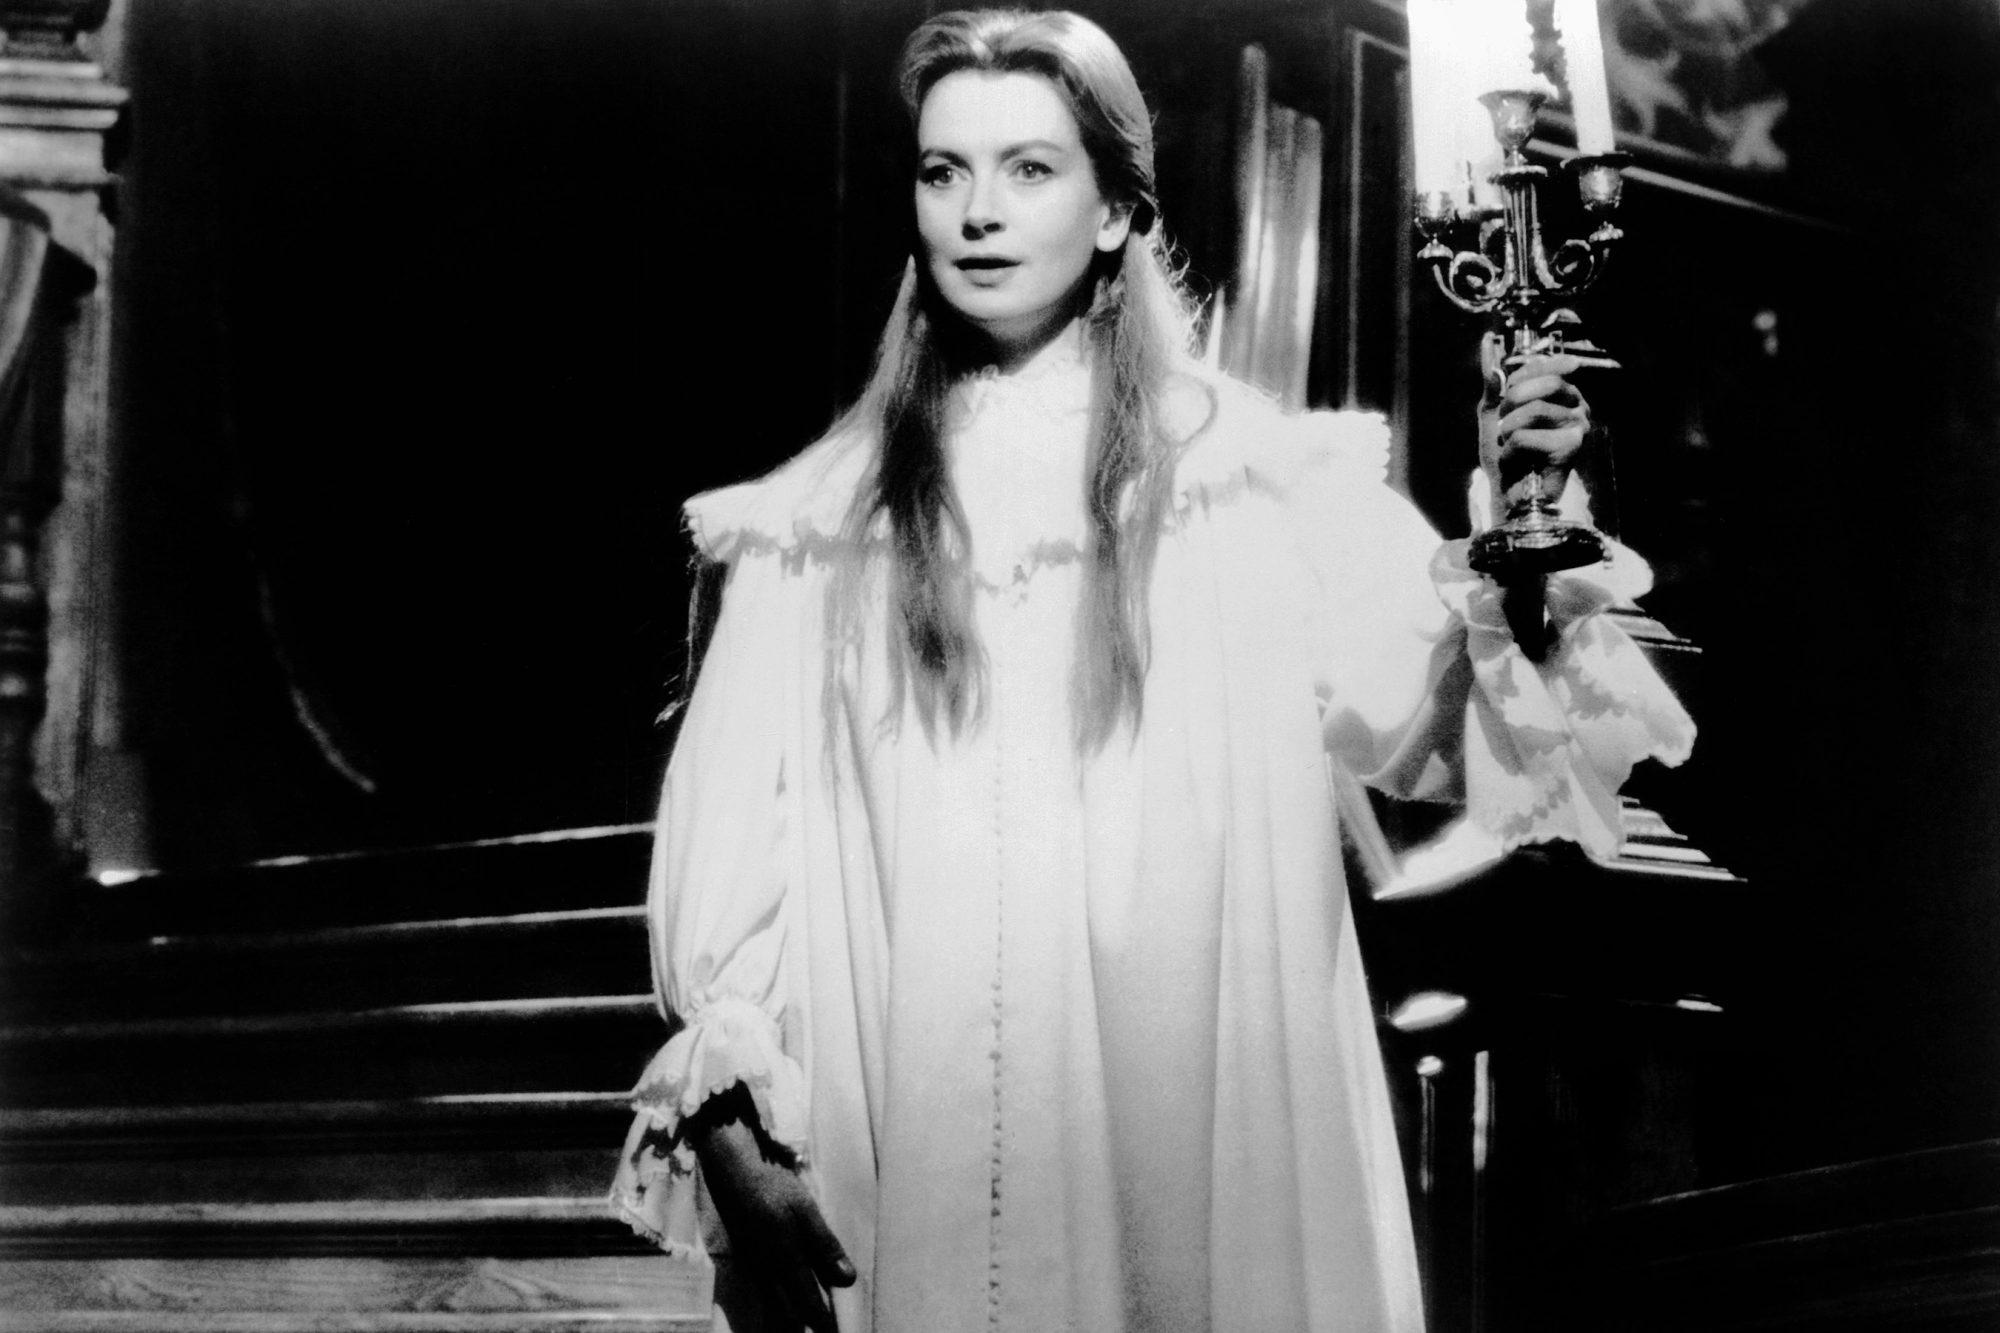 THE INNOCENTS, Deborah Kerr, 1961, TM & Copyright ©20th Century Fox Film Corp./courtesy Everett Coll